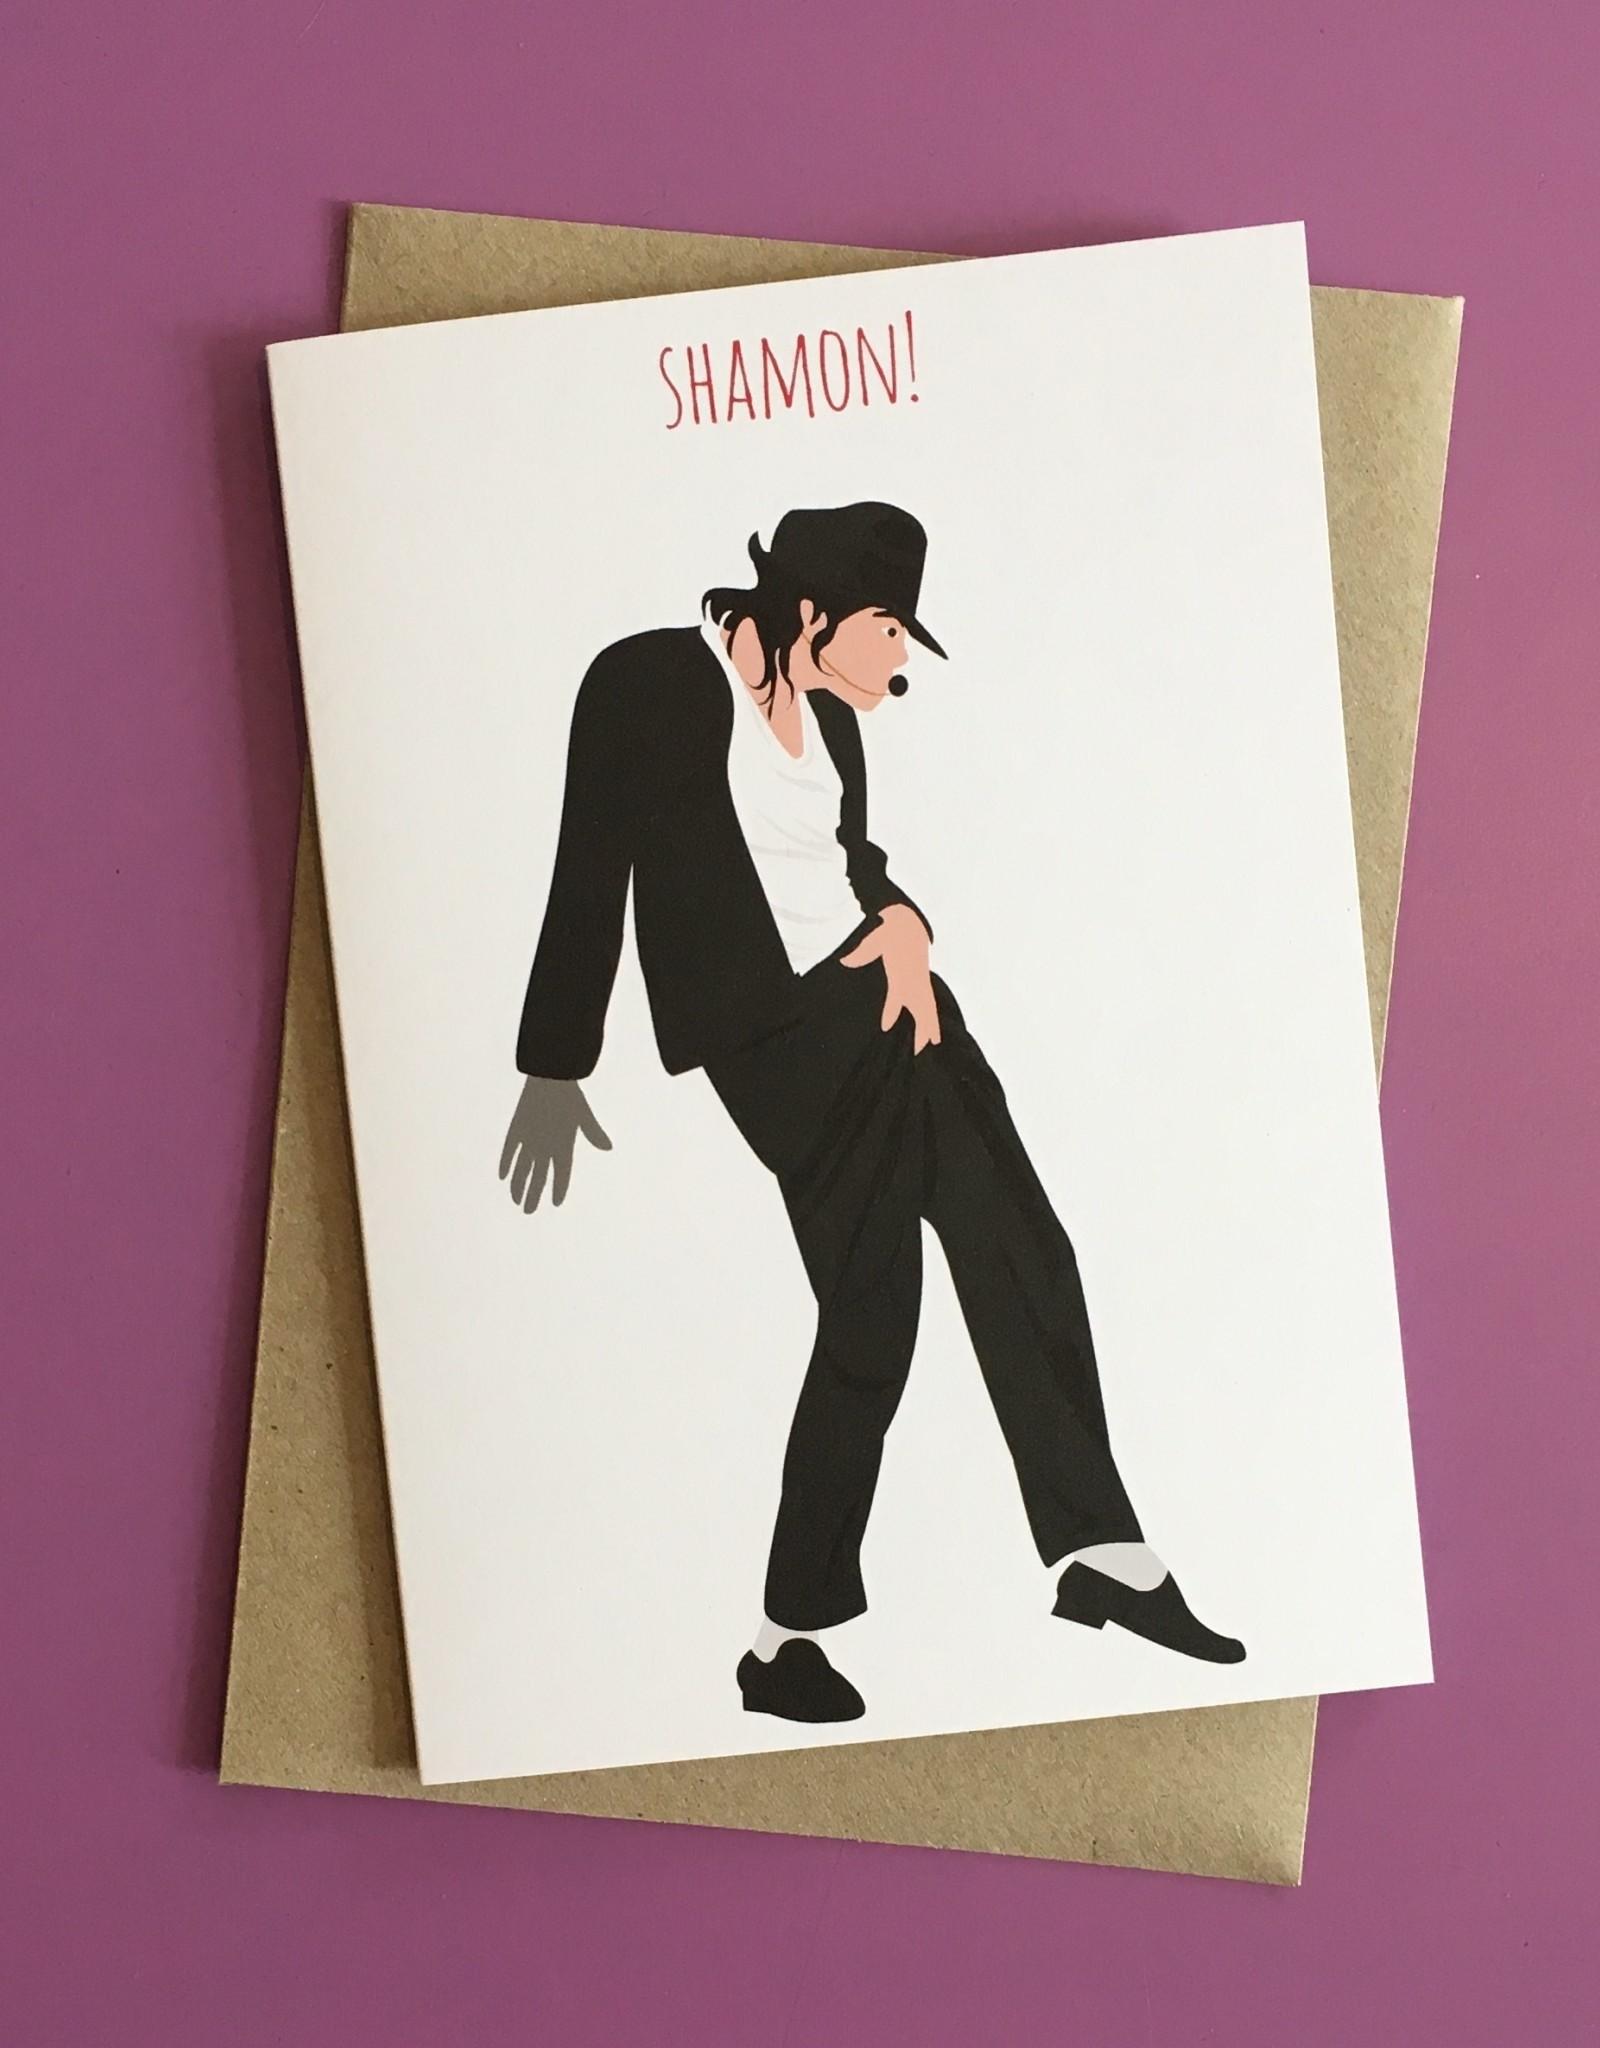 Shamon! (Michael Jackson) Greeting Card